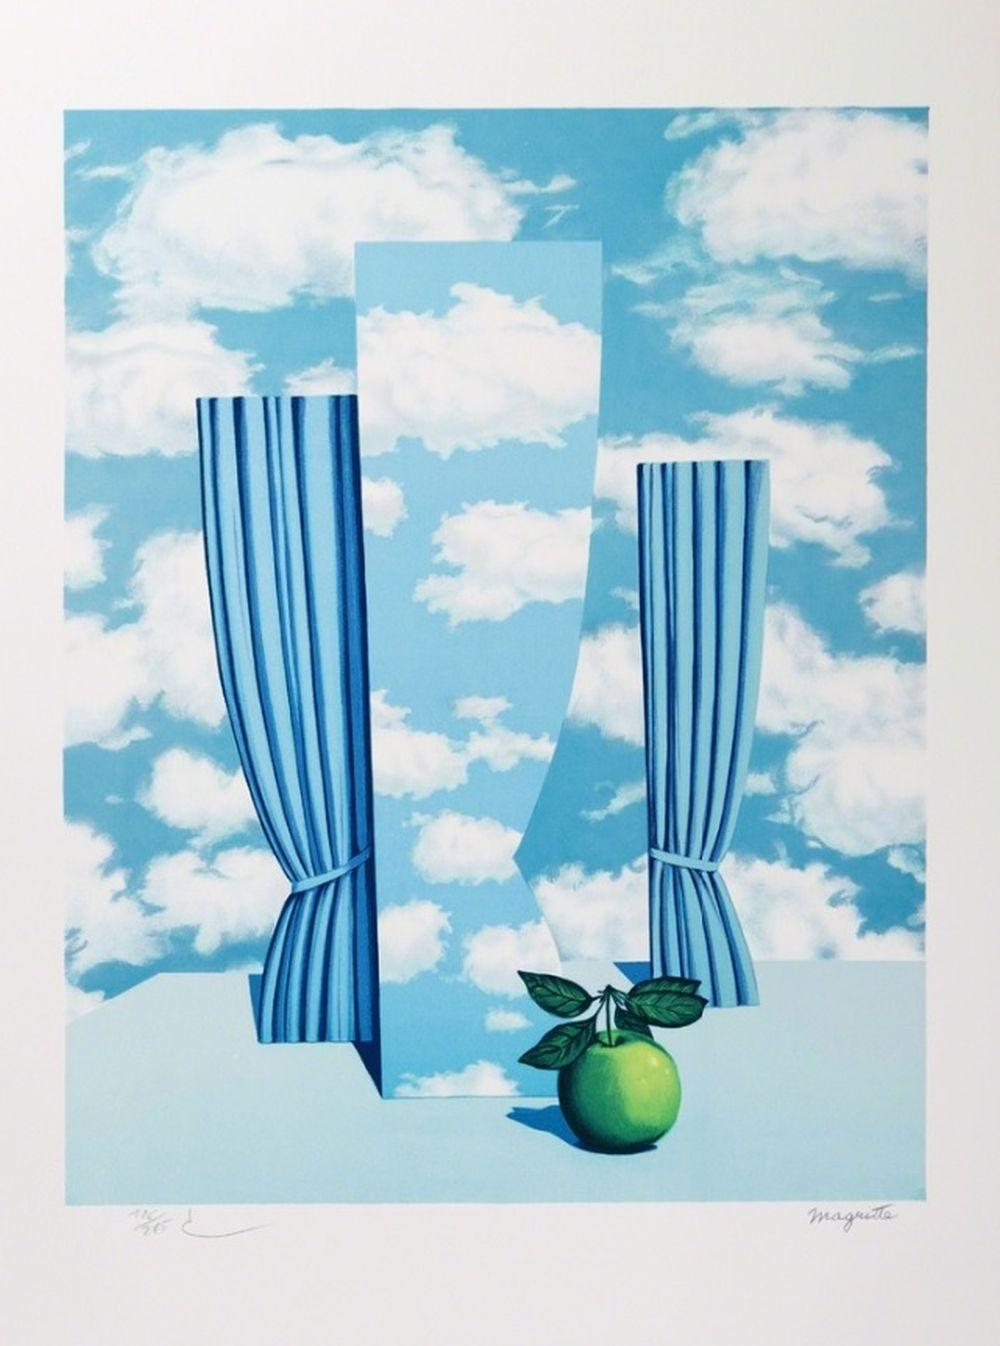 René Magritte - Le Beau Monde MM (The Beautiful World)